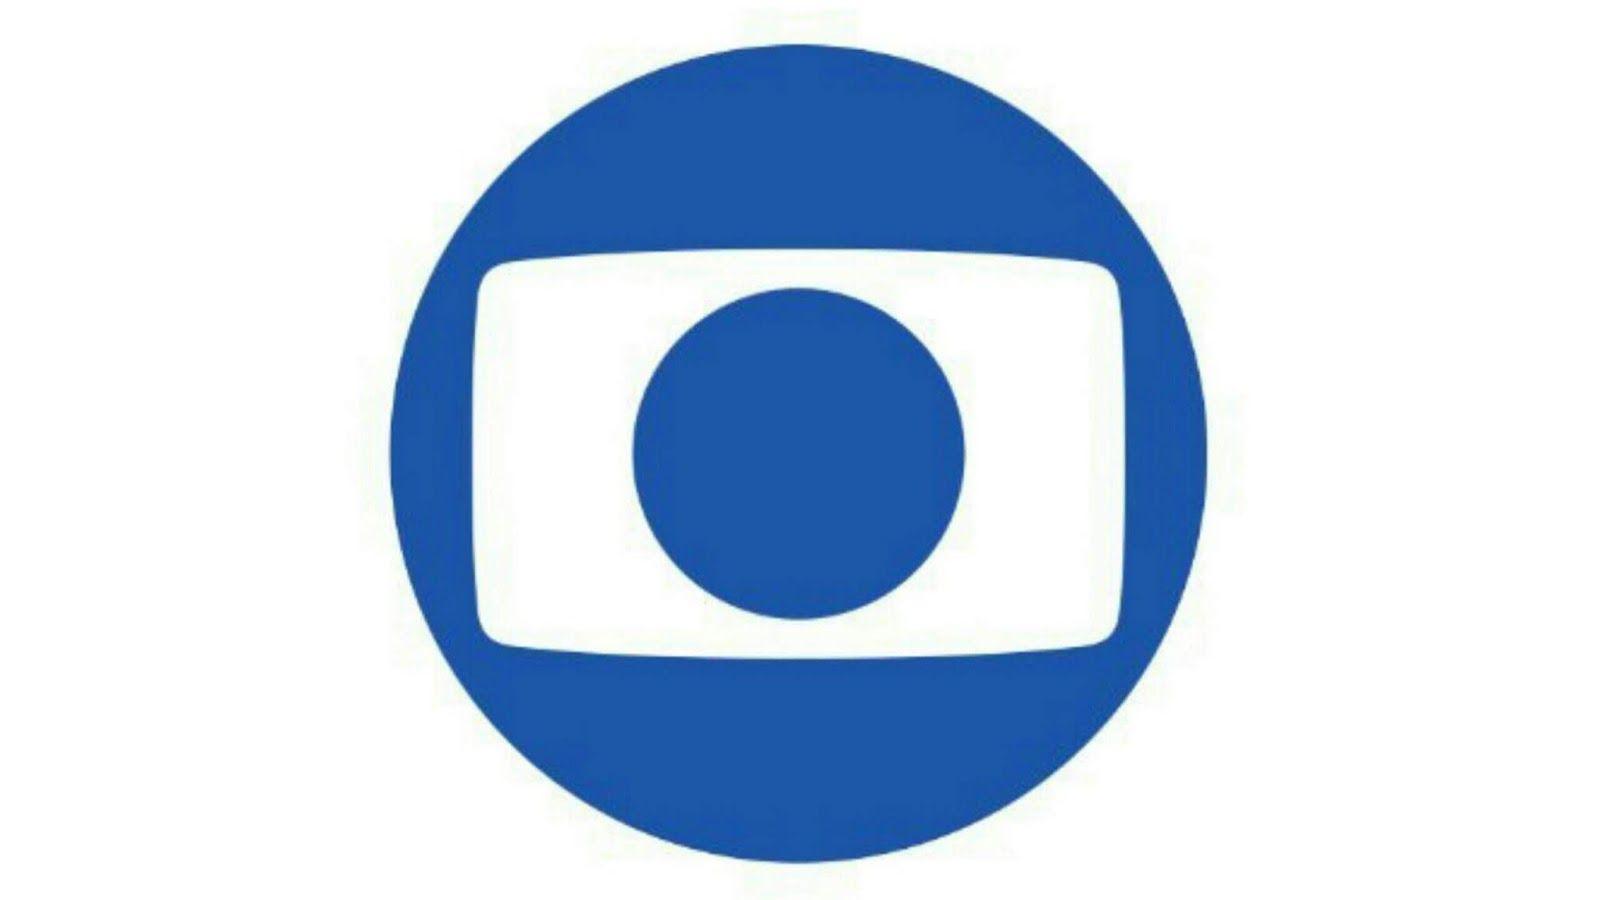 Programacao Globo Terca 3 De Dezembro De 2019 Emissoras De Tv Globo Programacao